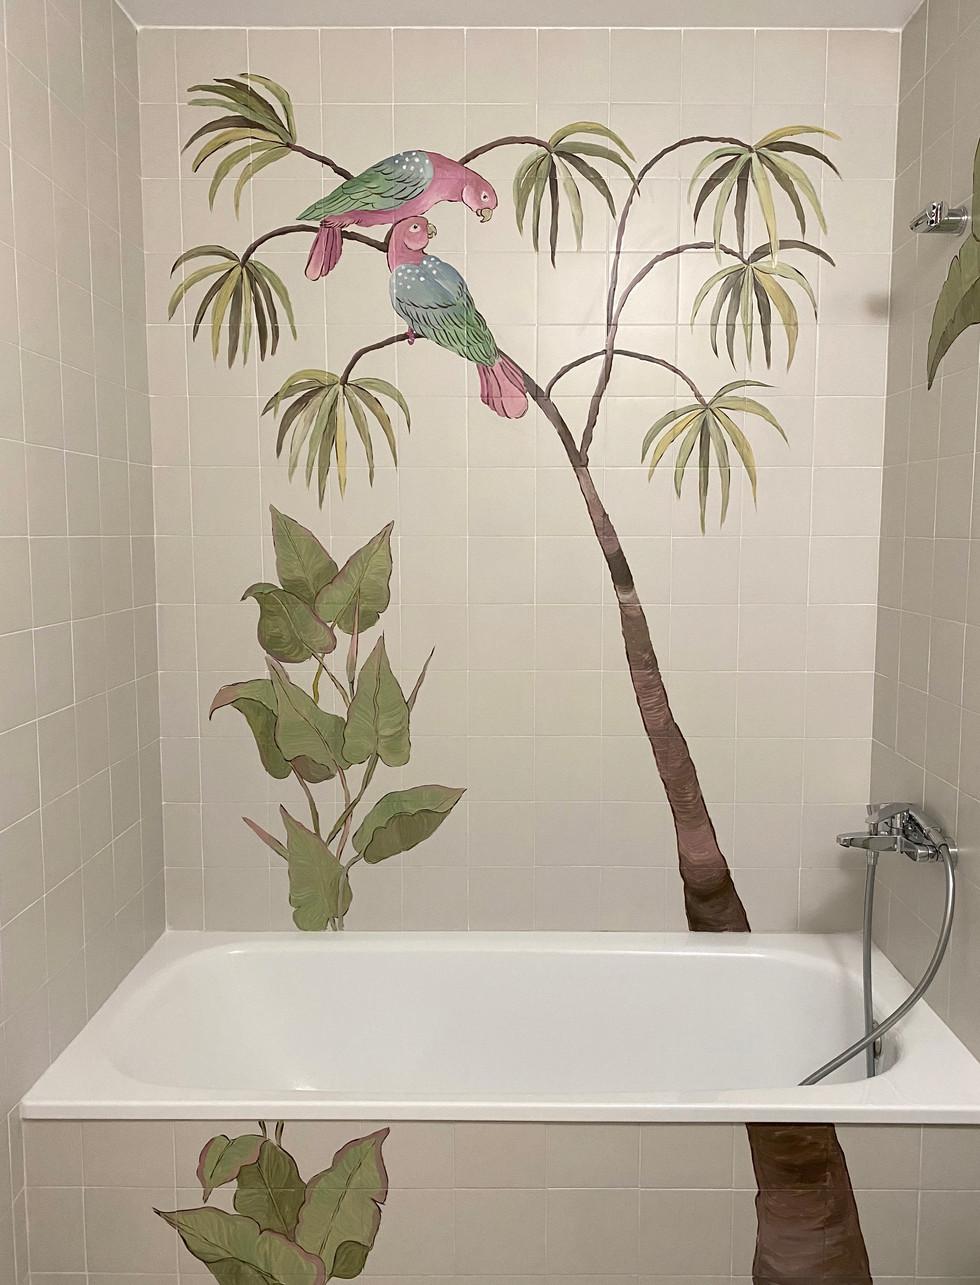 02-baño-CarmenMadrid_GiselaTalita.jpg